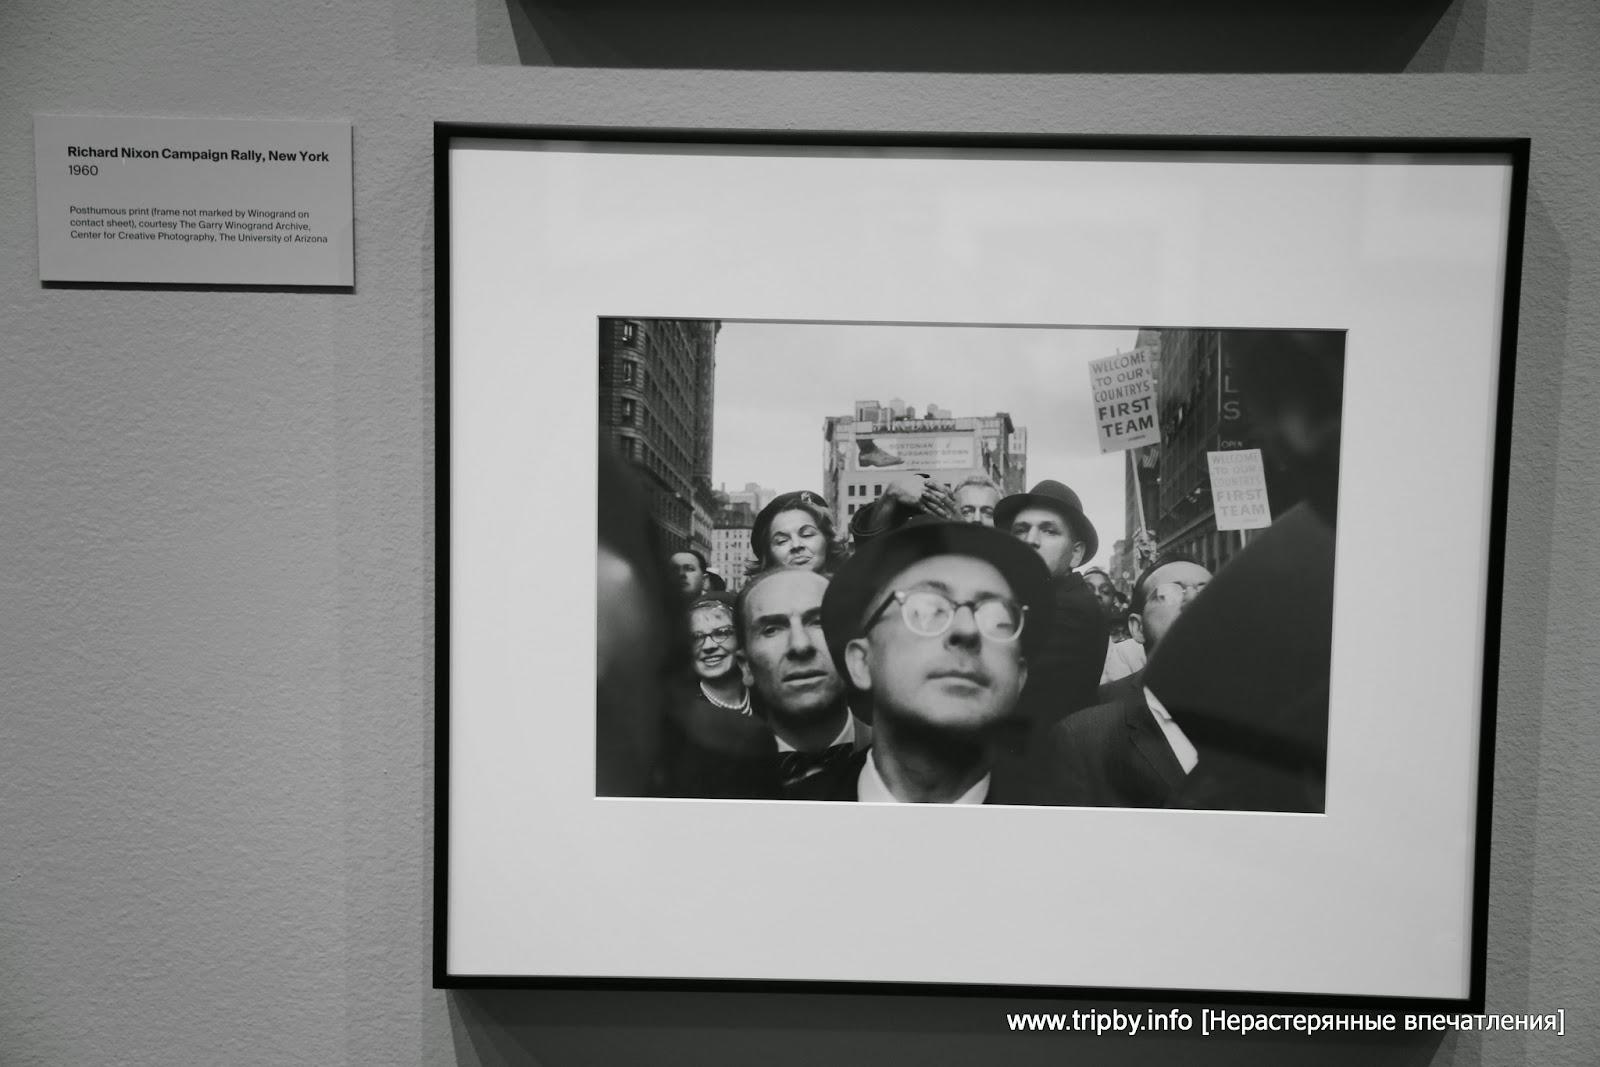 Richard Nixon Campaign Rally, New York